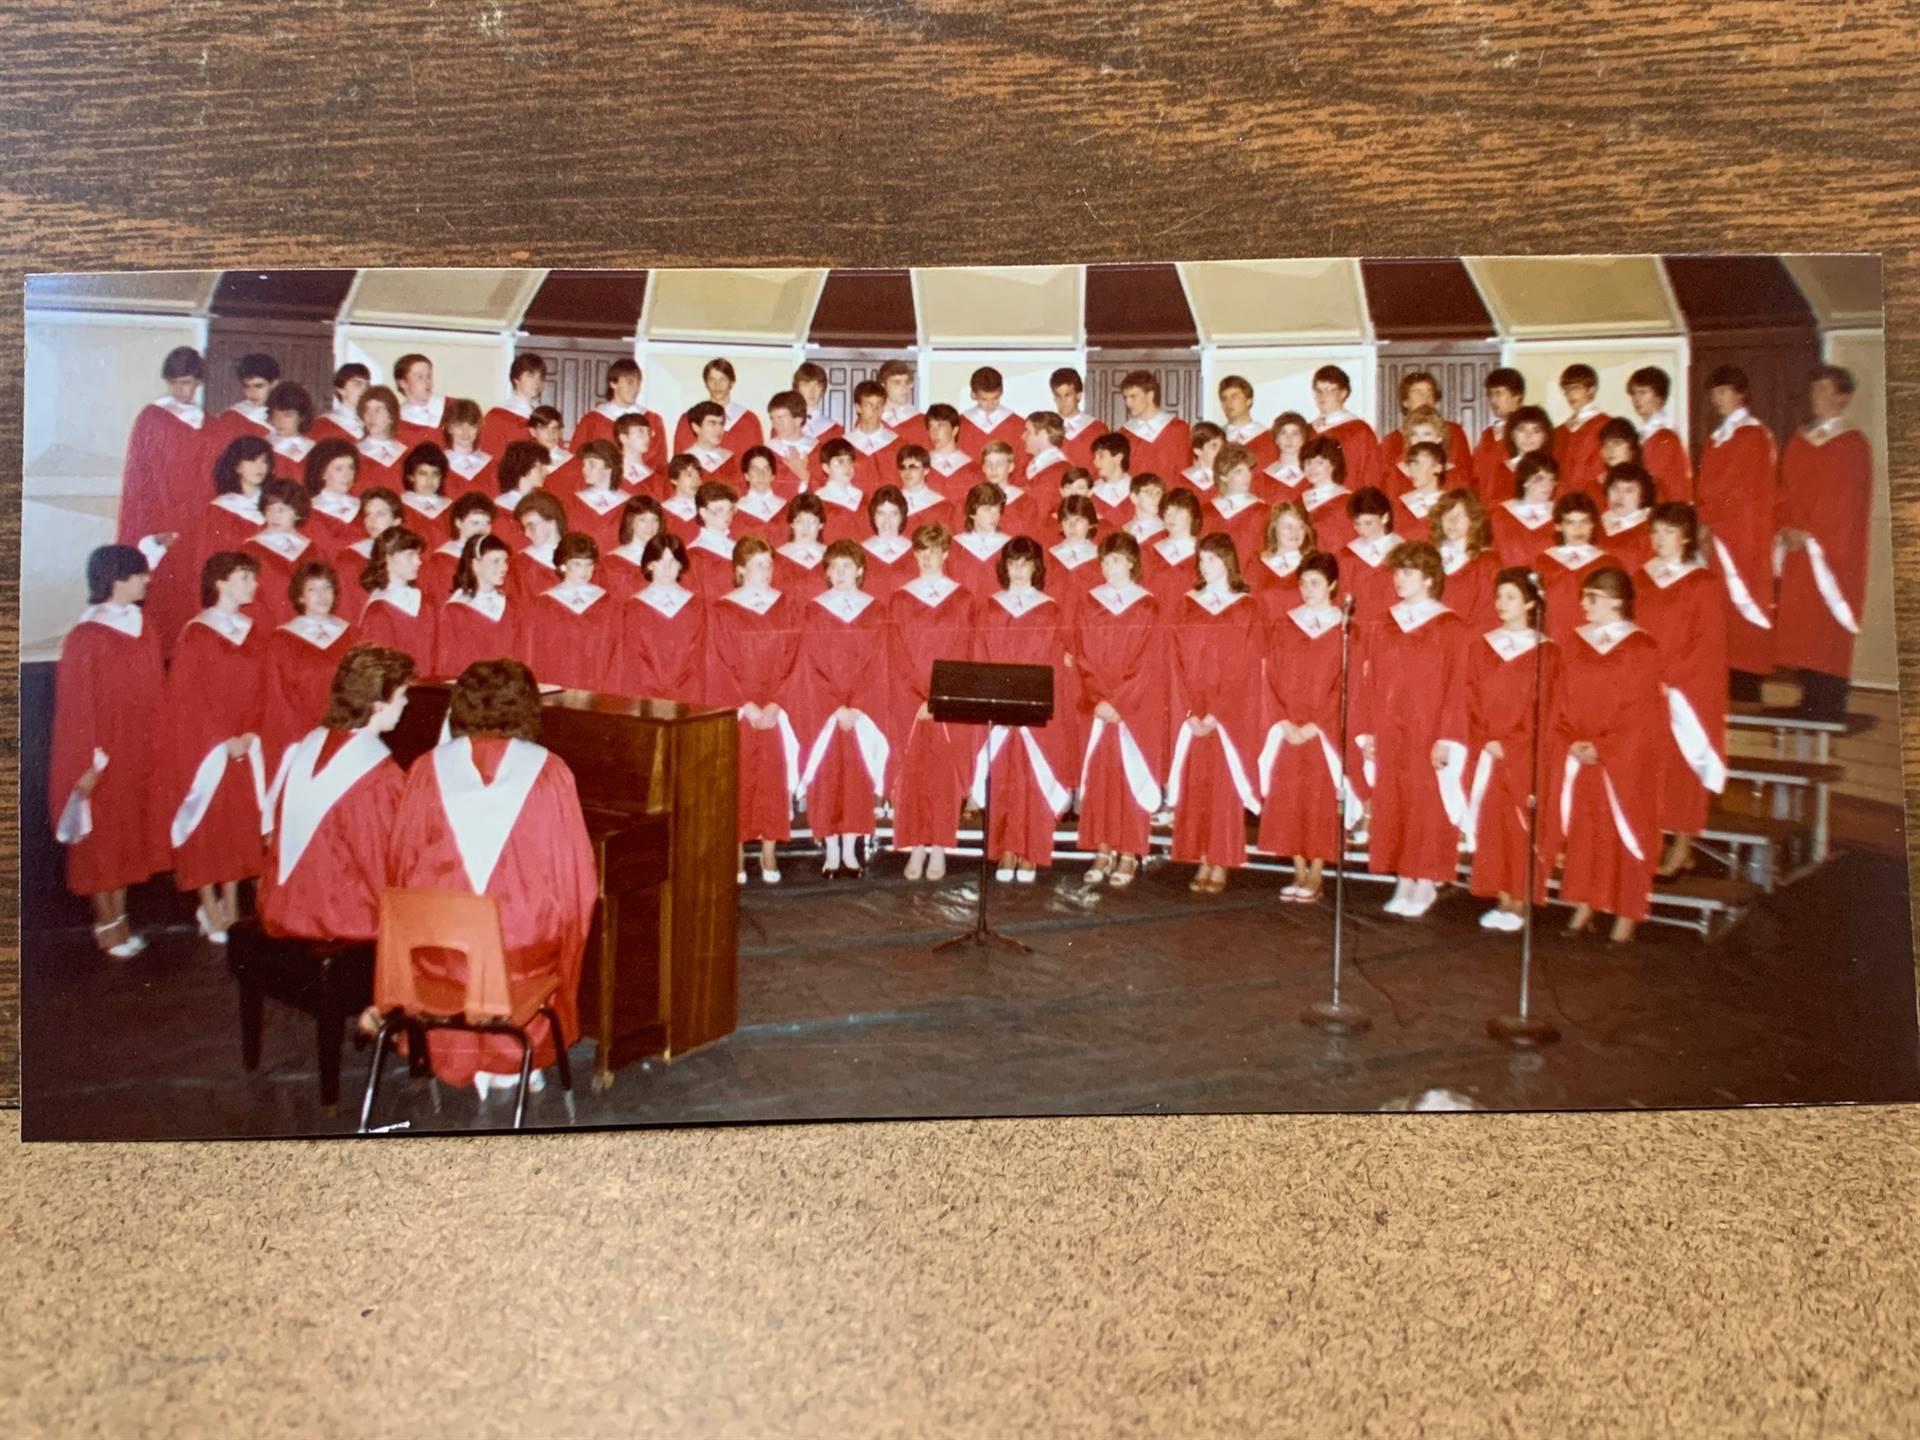 Unknown choir